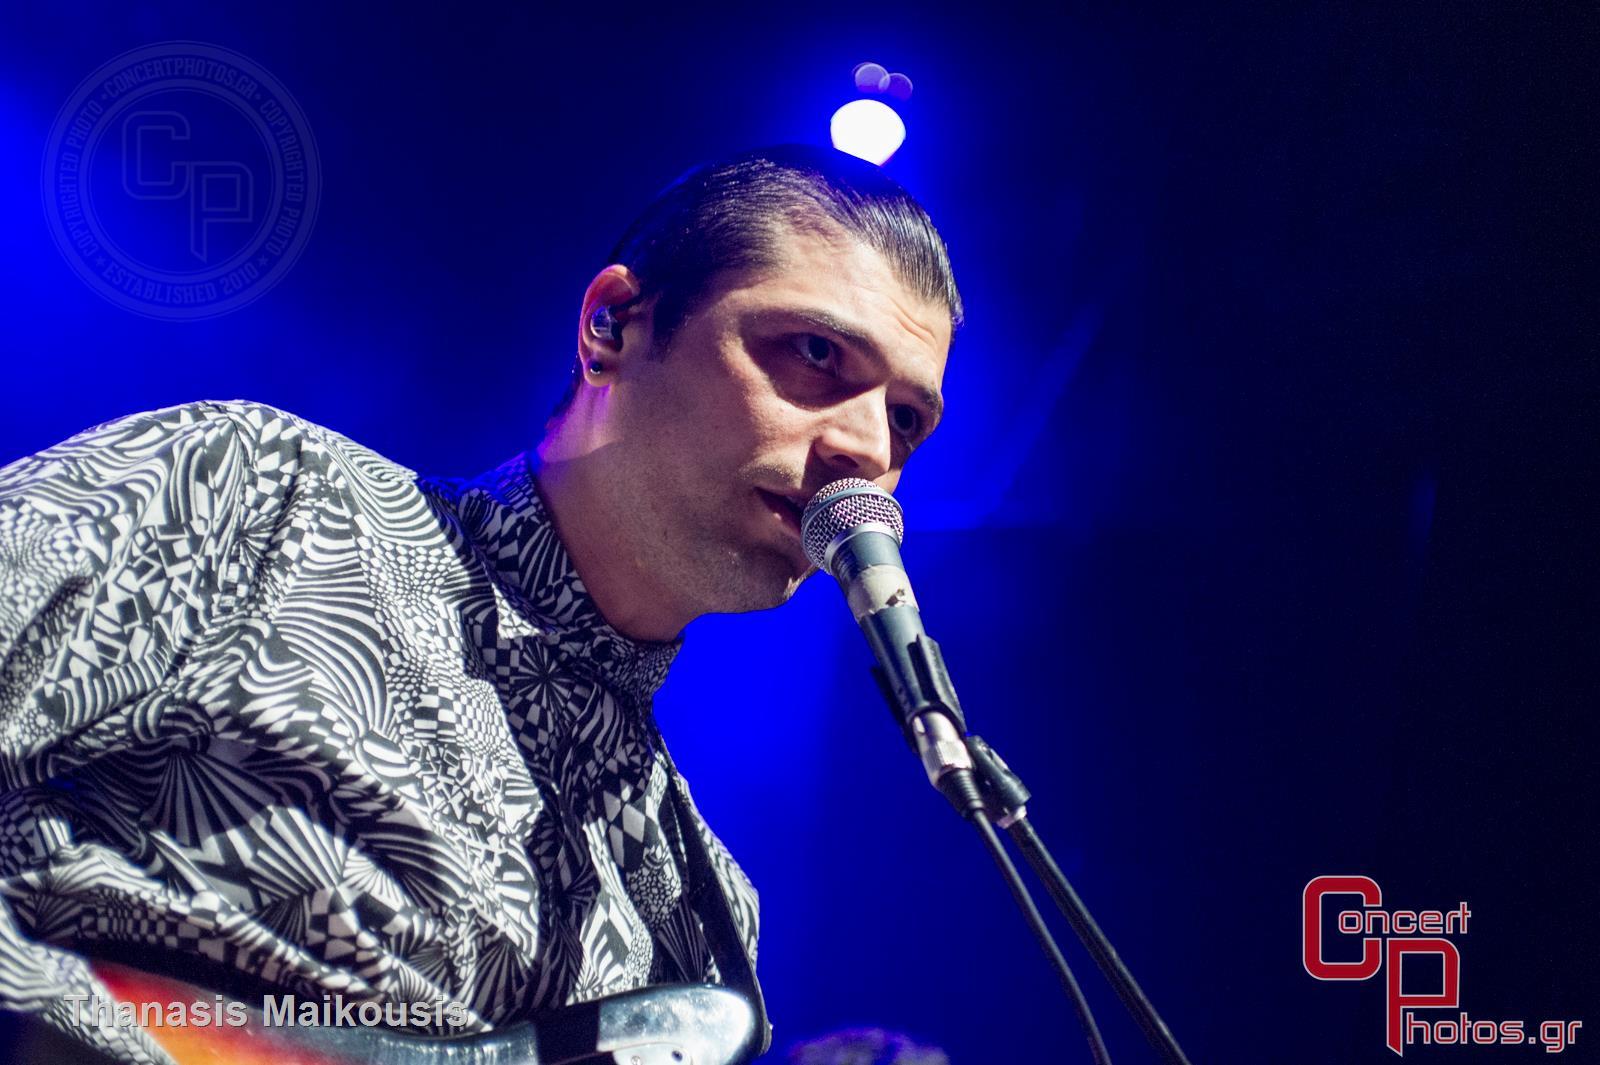 Tricky - Spectralfire-Tricky - Spectralfire photographer: Thanasis Maikousis - concertphotos_-3432